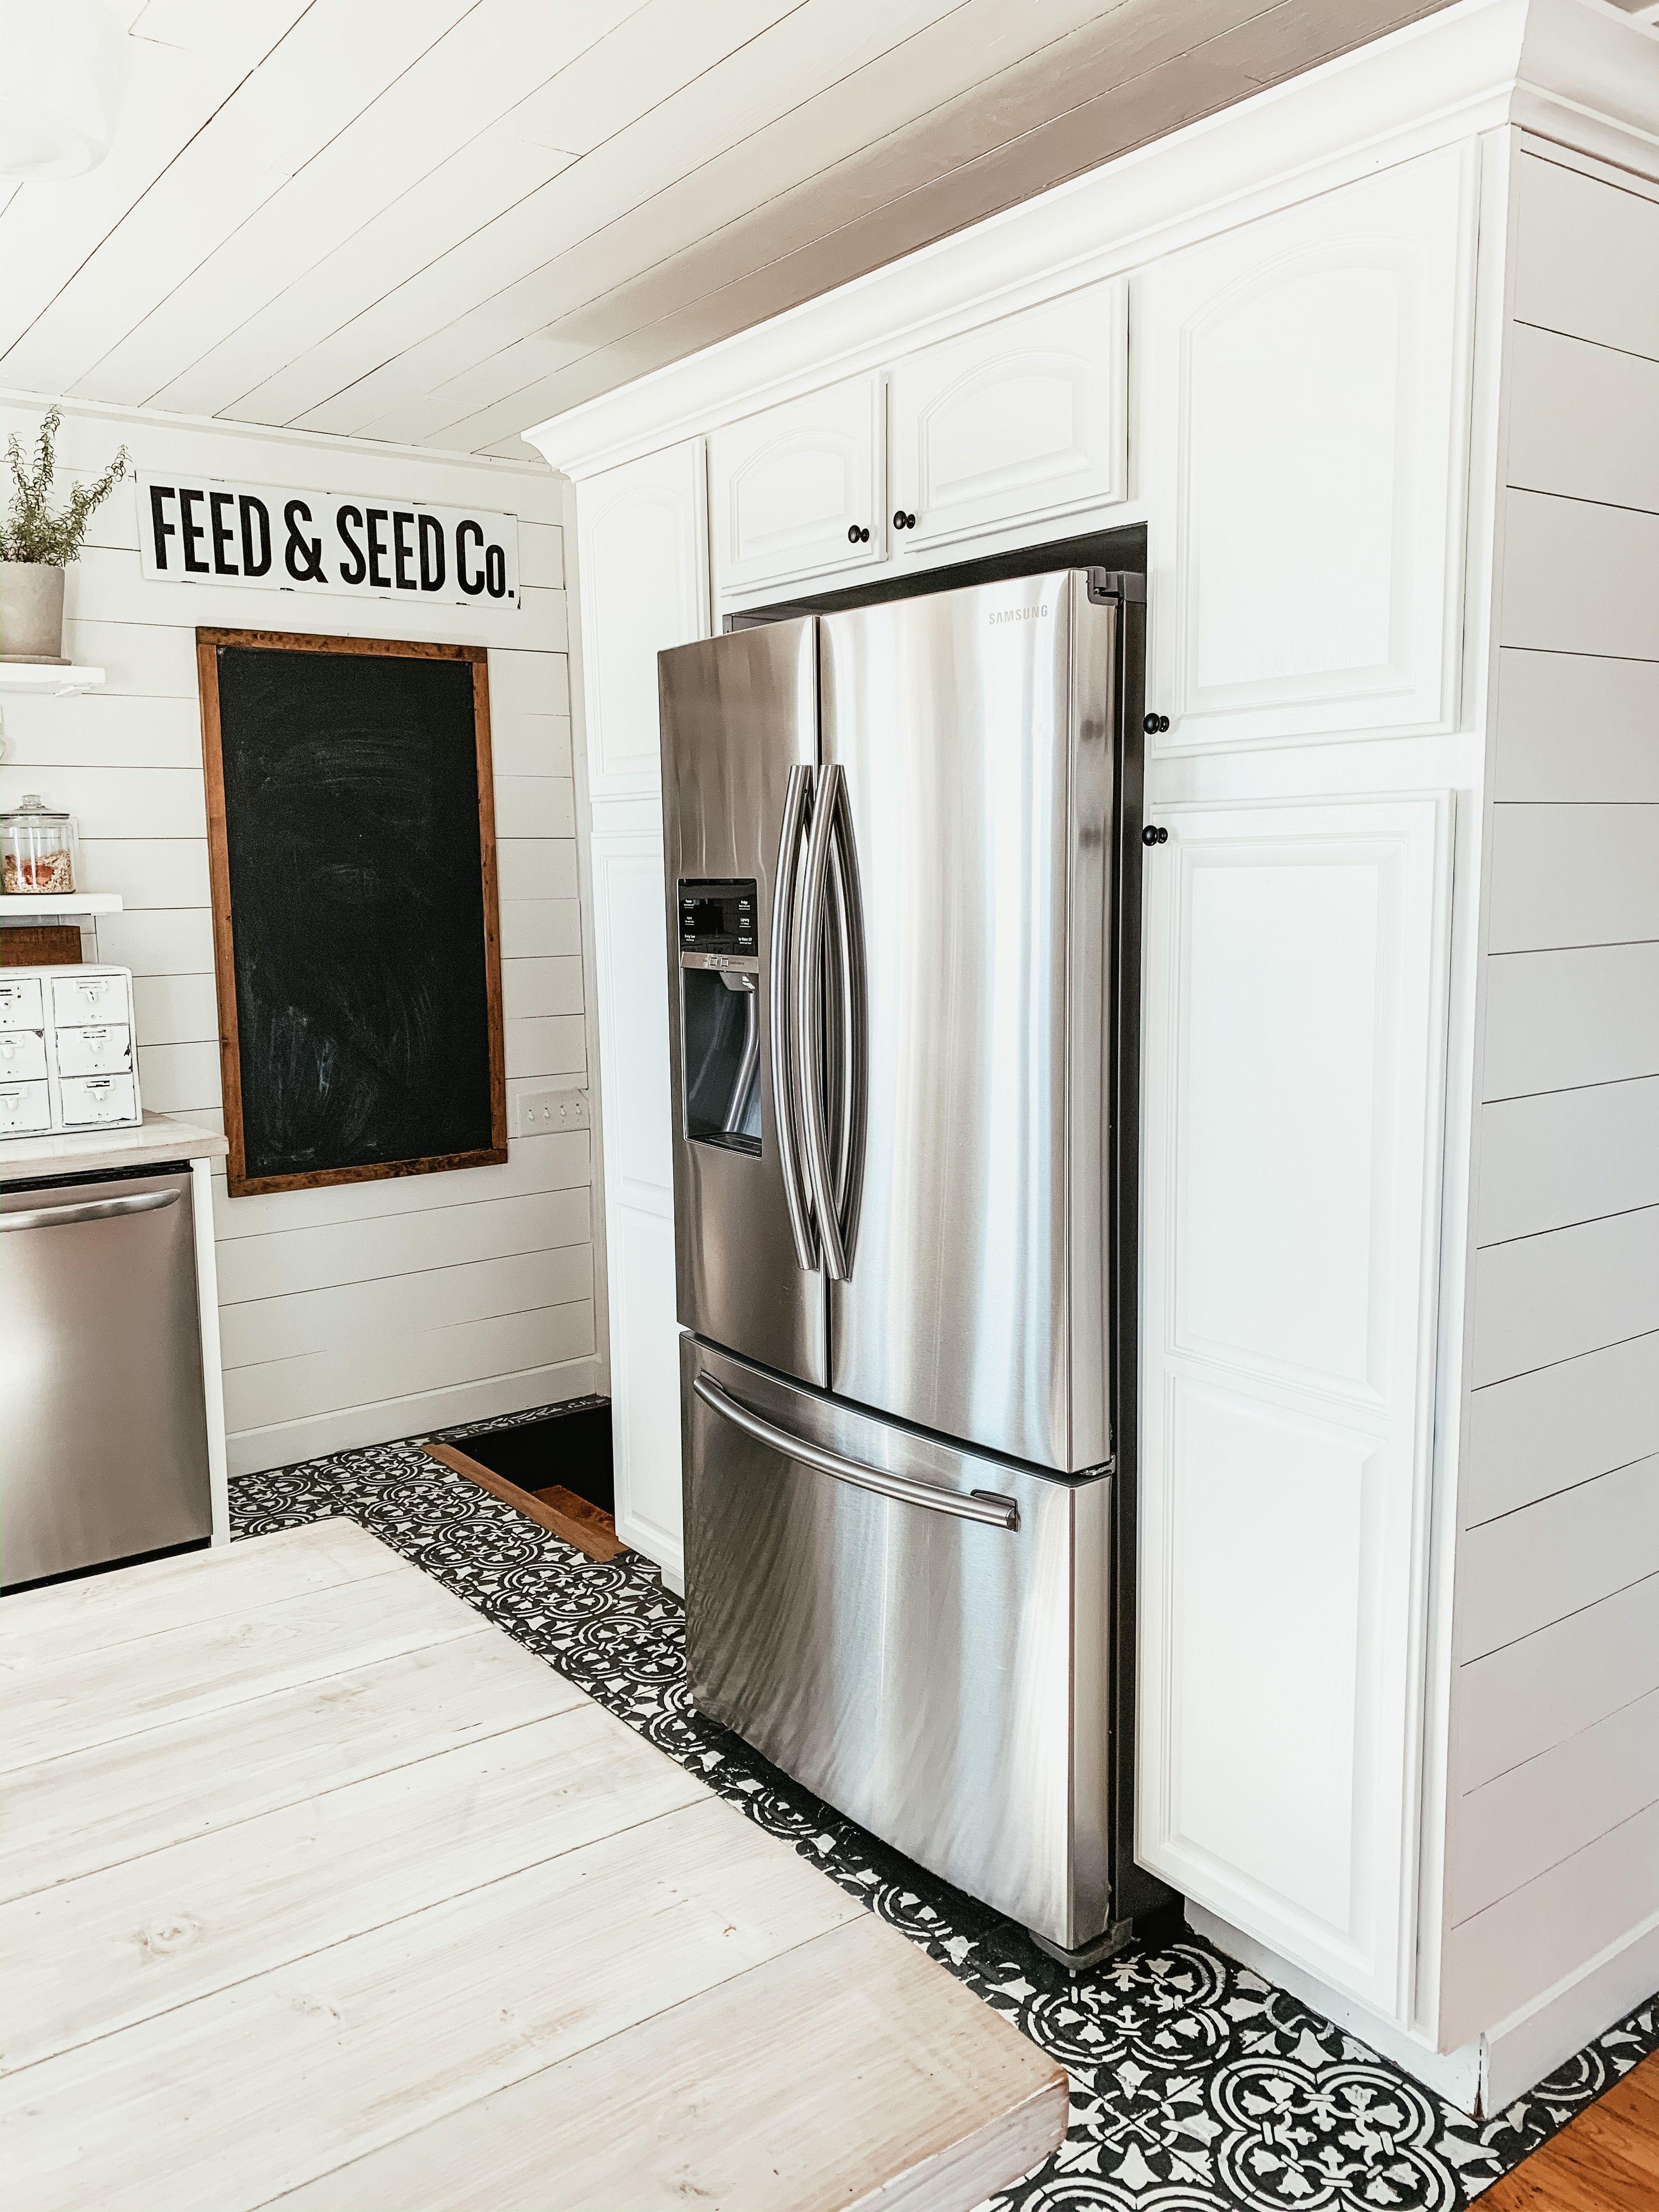 Builtin look with samsung counter depth refrigerator